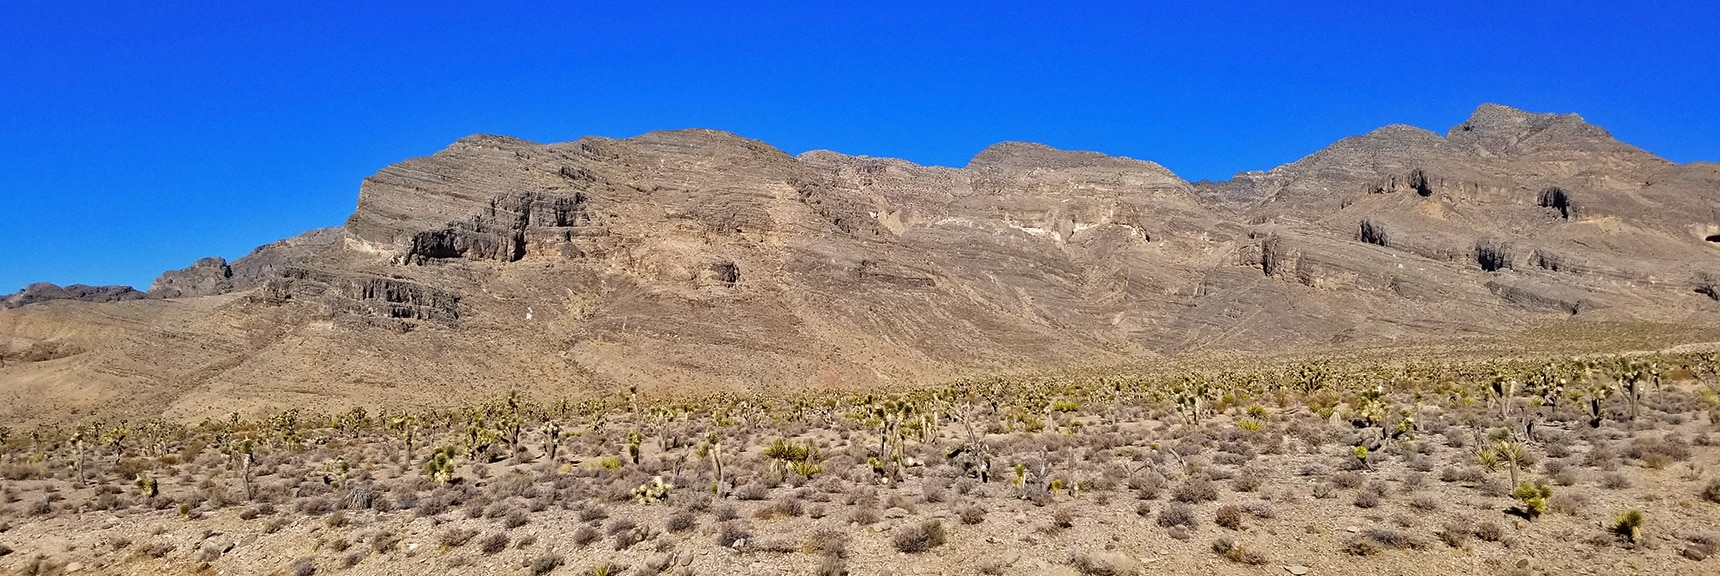 Southern Sheep Range Viewed from Mormon Well Road   Lower Mormon Well Road   Sheep Range, Desert National Wildlife Refuge, Nevada